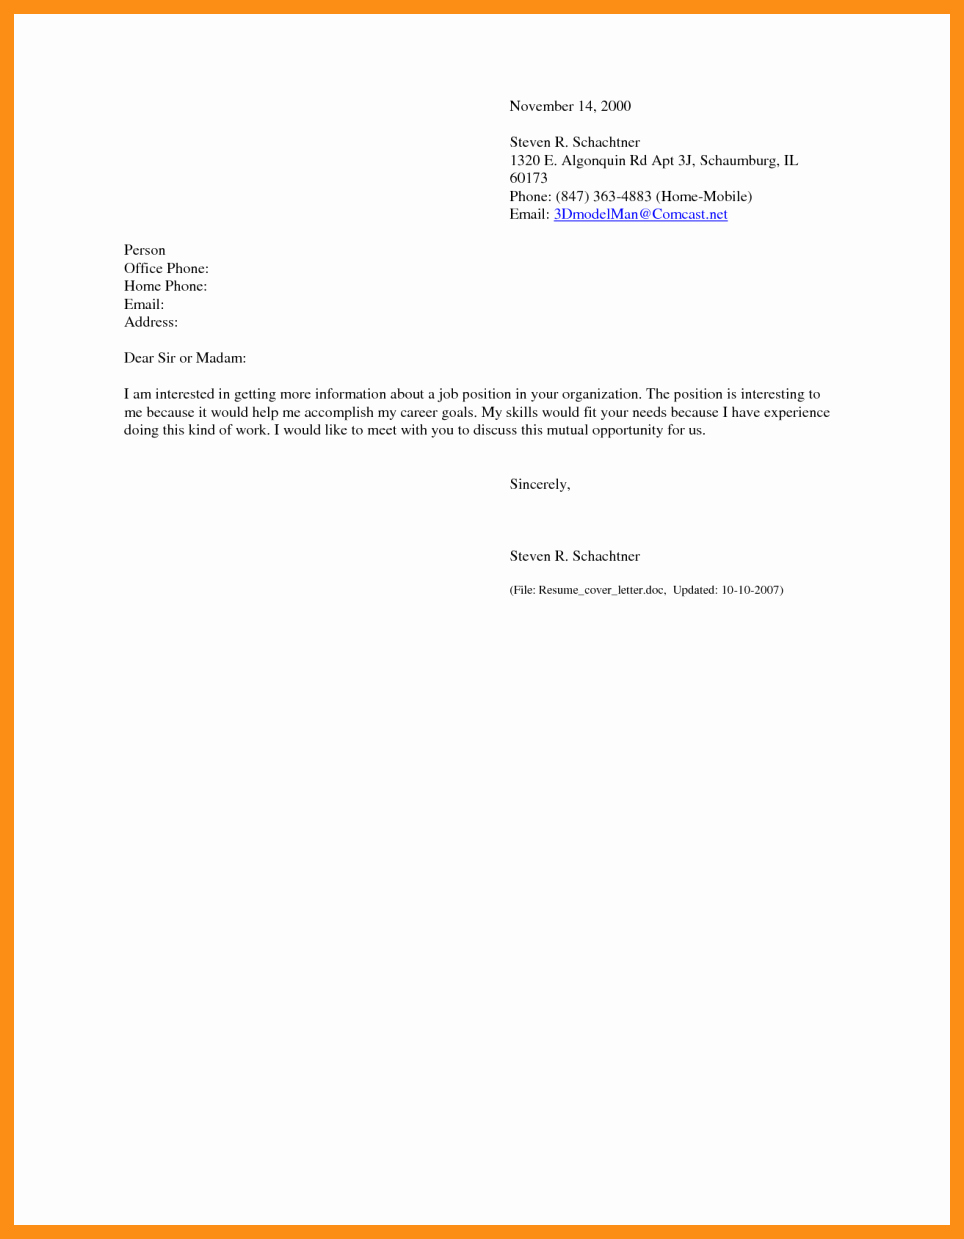 Email Cover Letter Example Luxury Sending Resume Via Email Sample